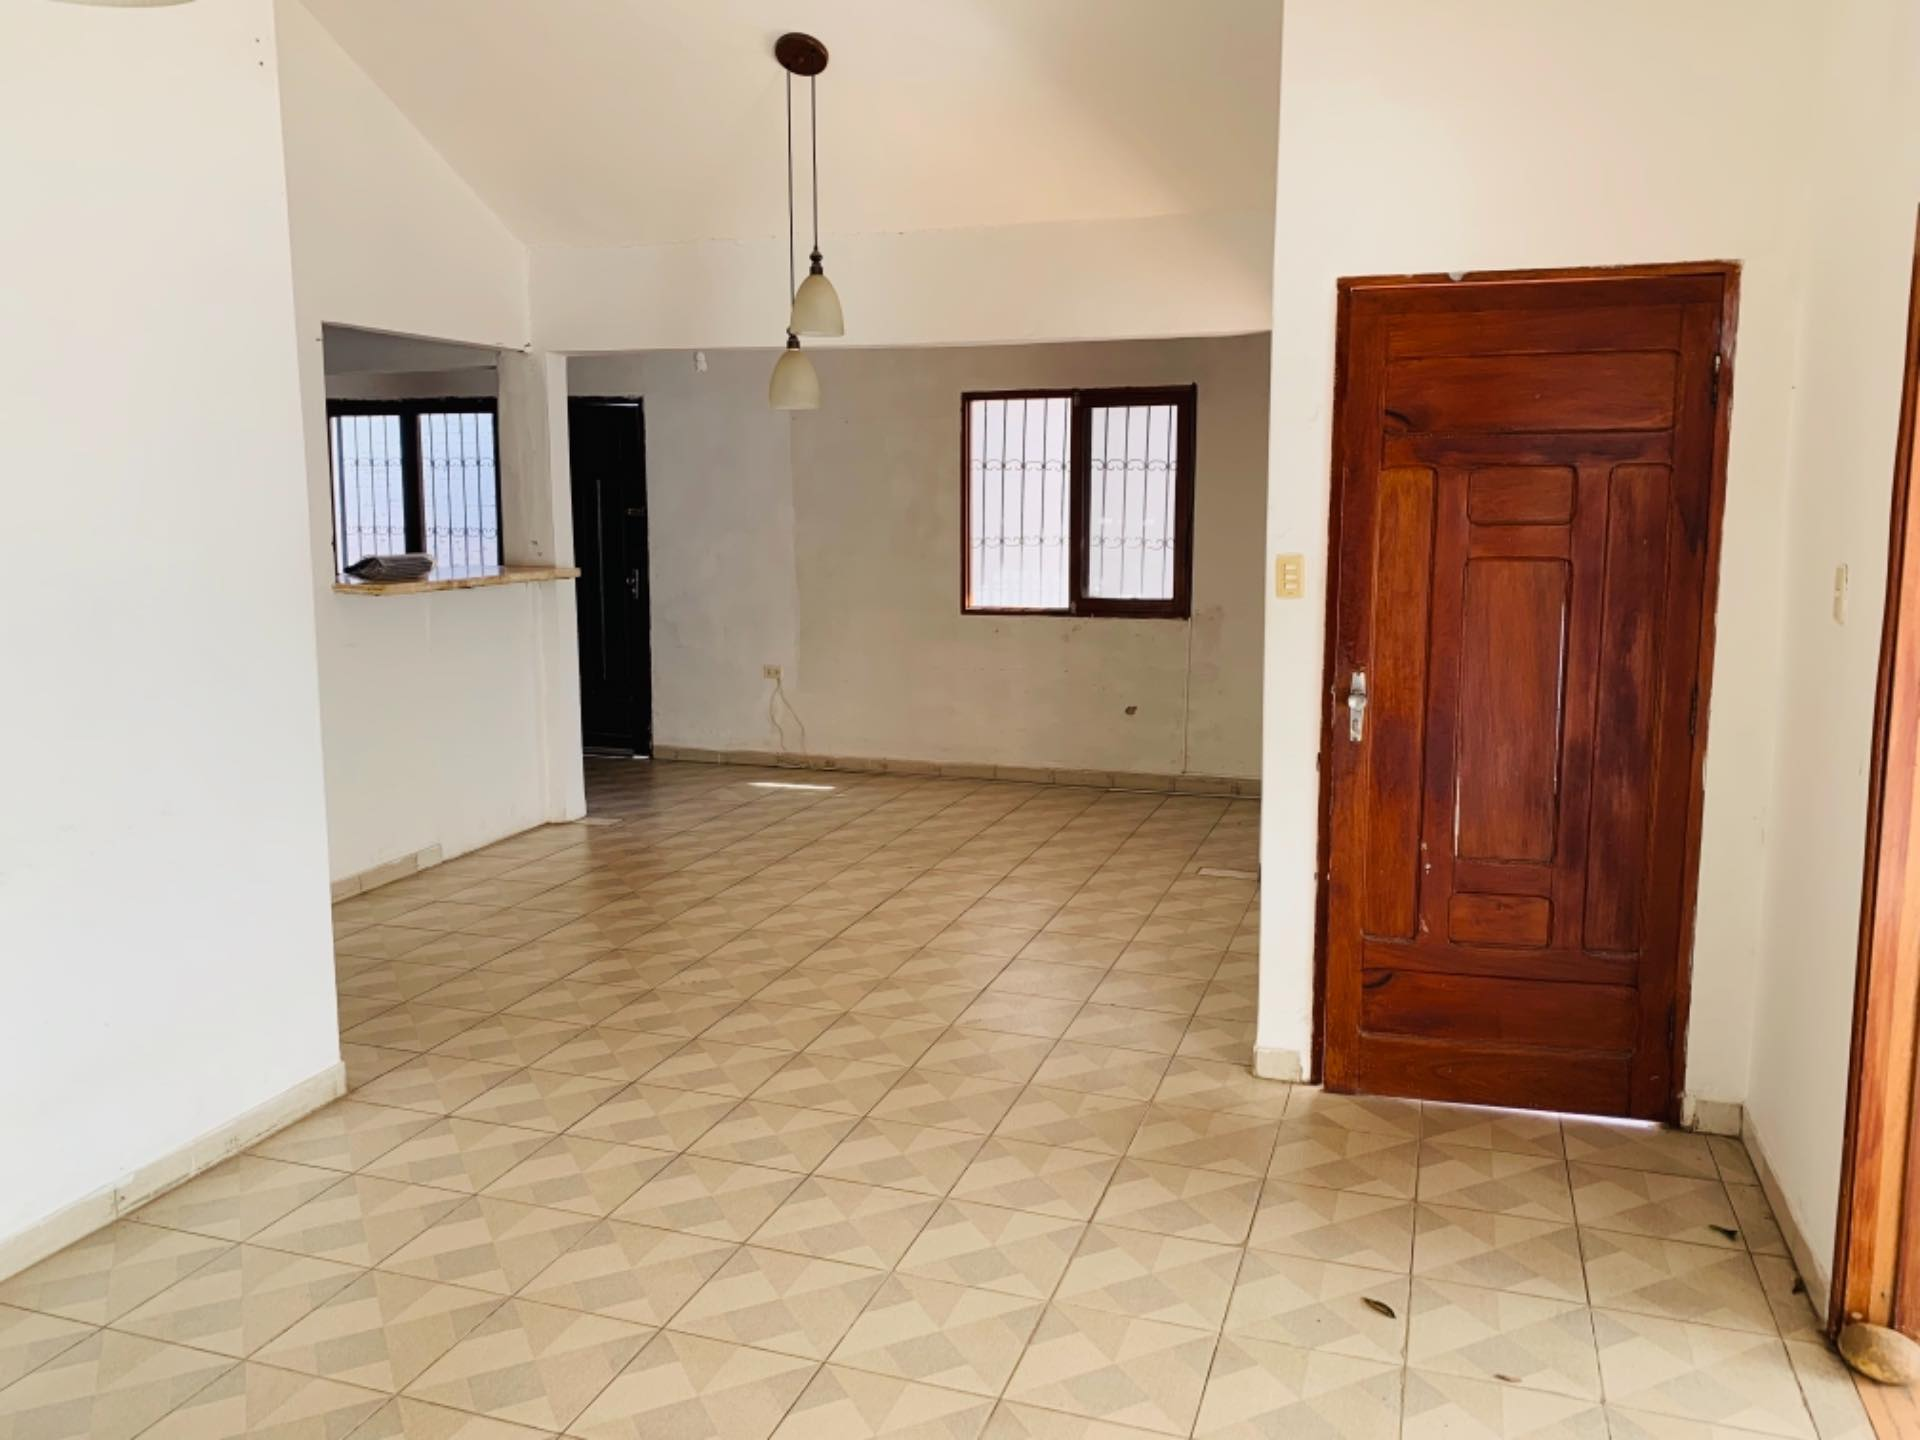 Casa en Alquiler Barrio Equipetrol entre 3er y 4to Anillo Foto 3